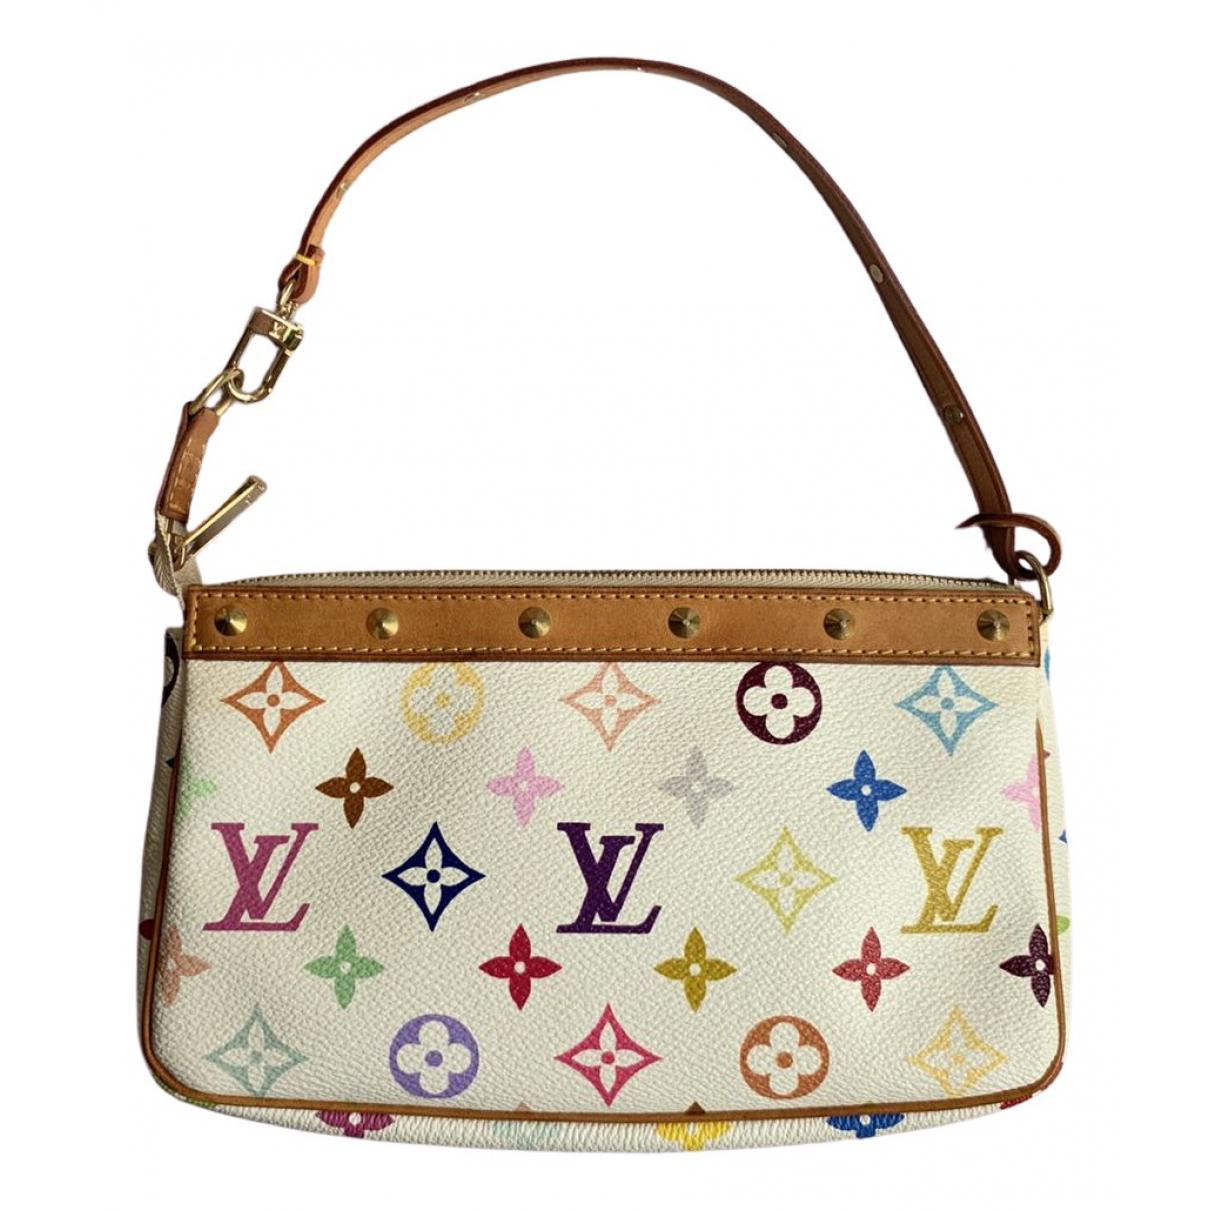 Louis Vuitton Pochette Accessoire Clutch in  Weiss Leinen